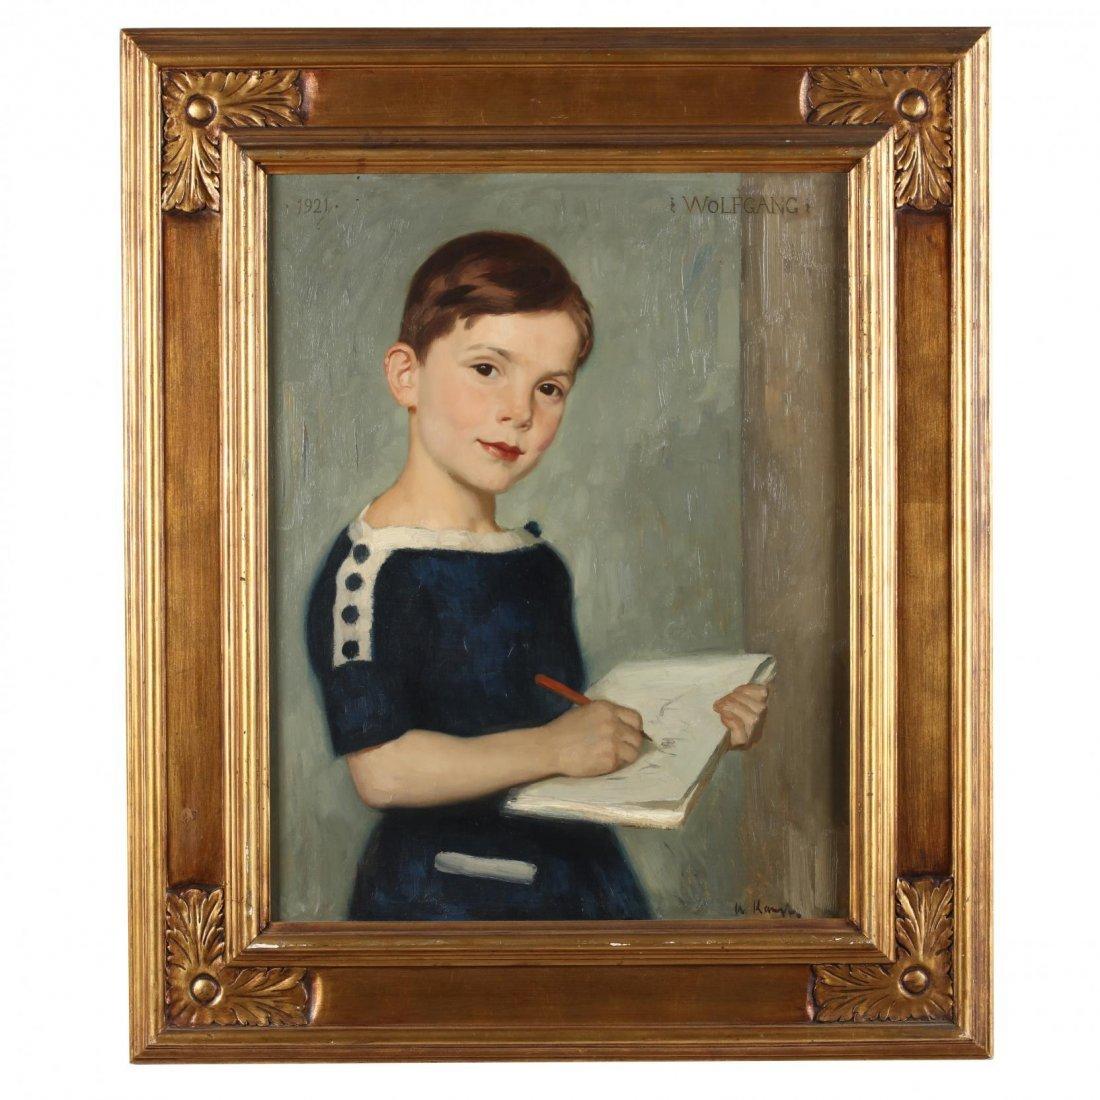 Arthur Kampf (German, 1864-1950), A Portrait of